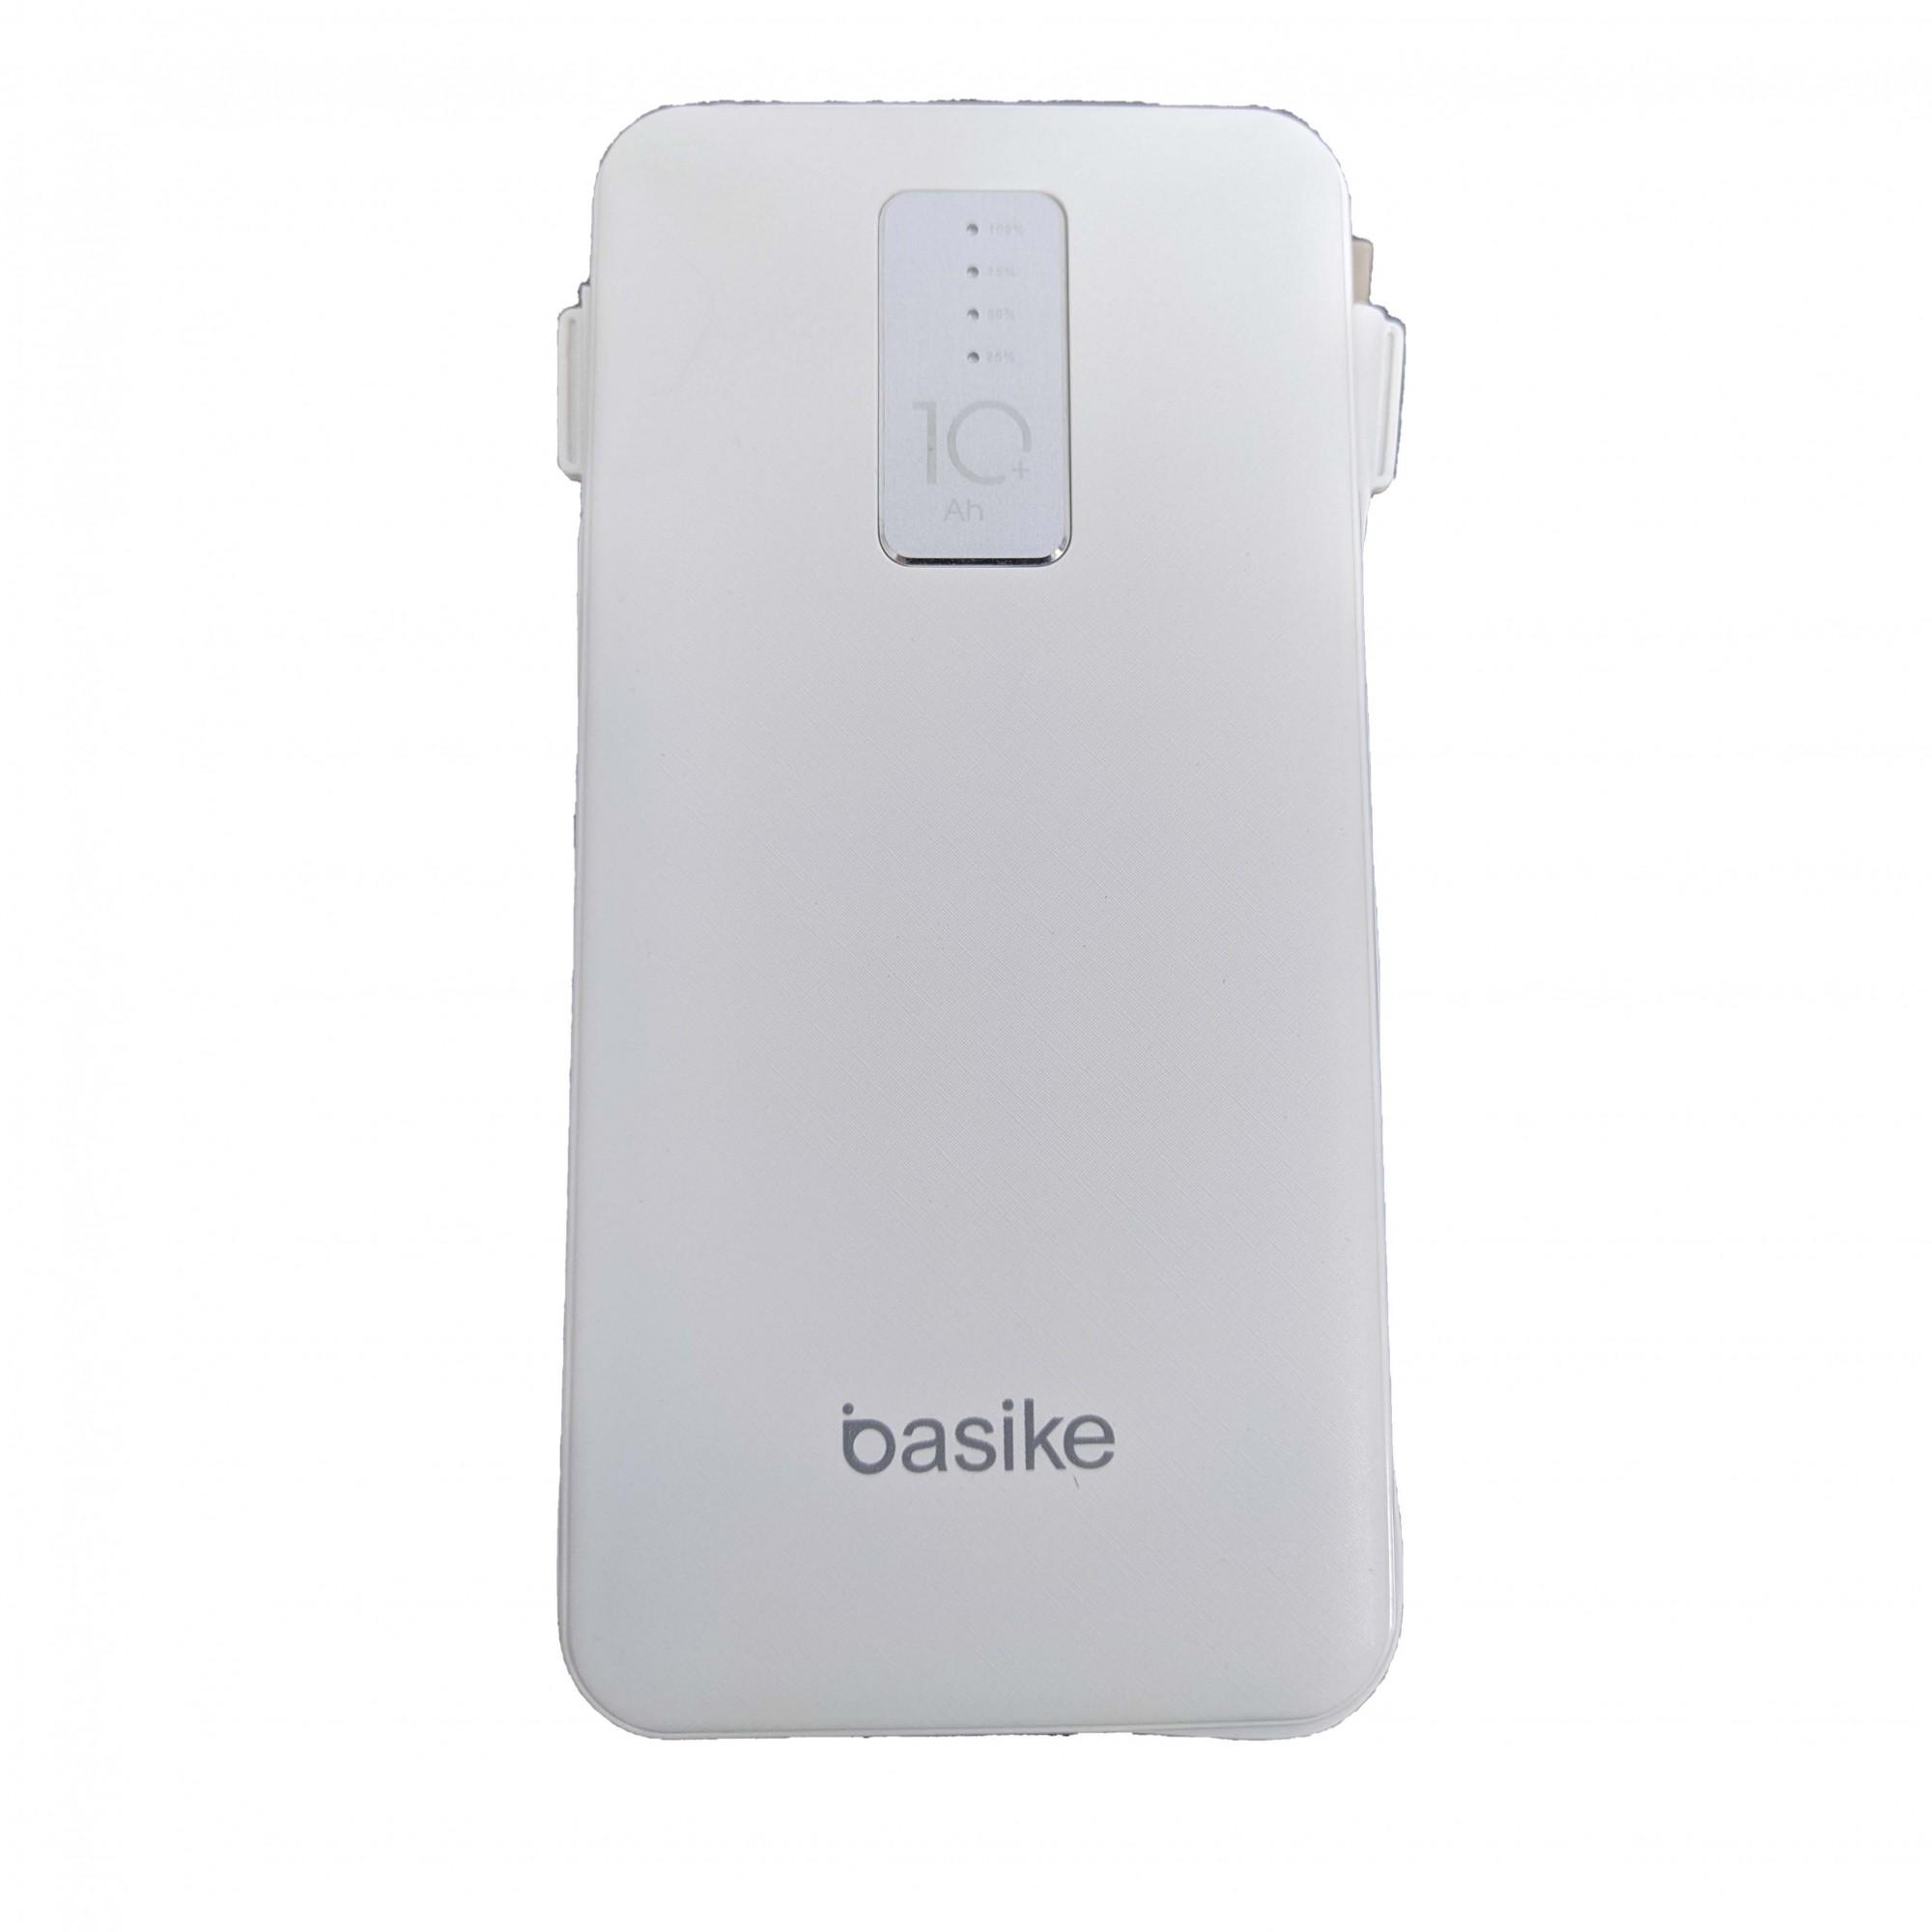 Bateria Power Bank 10000mAh Iphone Android Tipo C Ba-POW0001 Basike